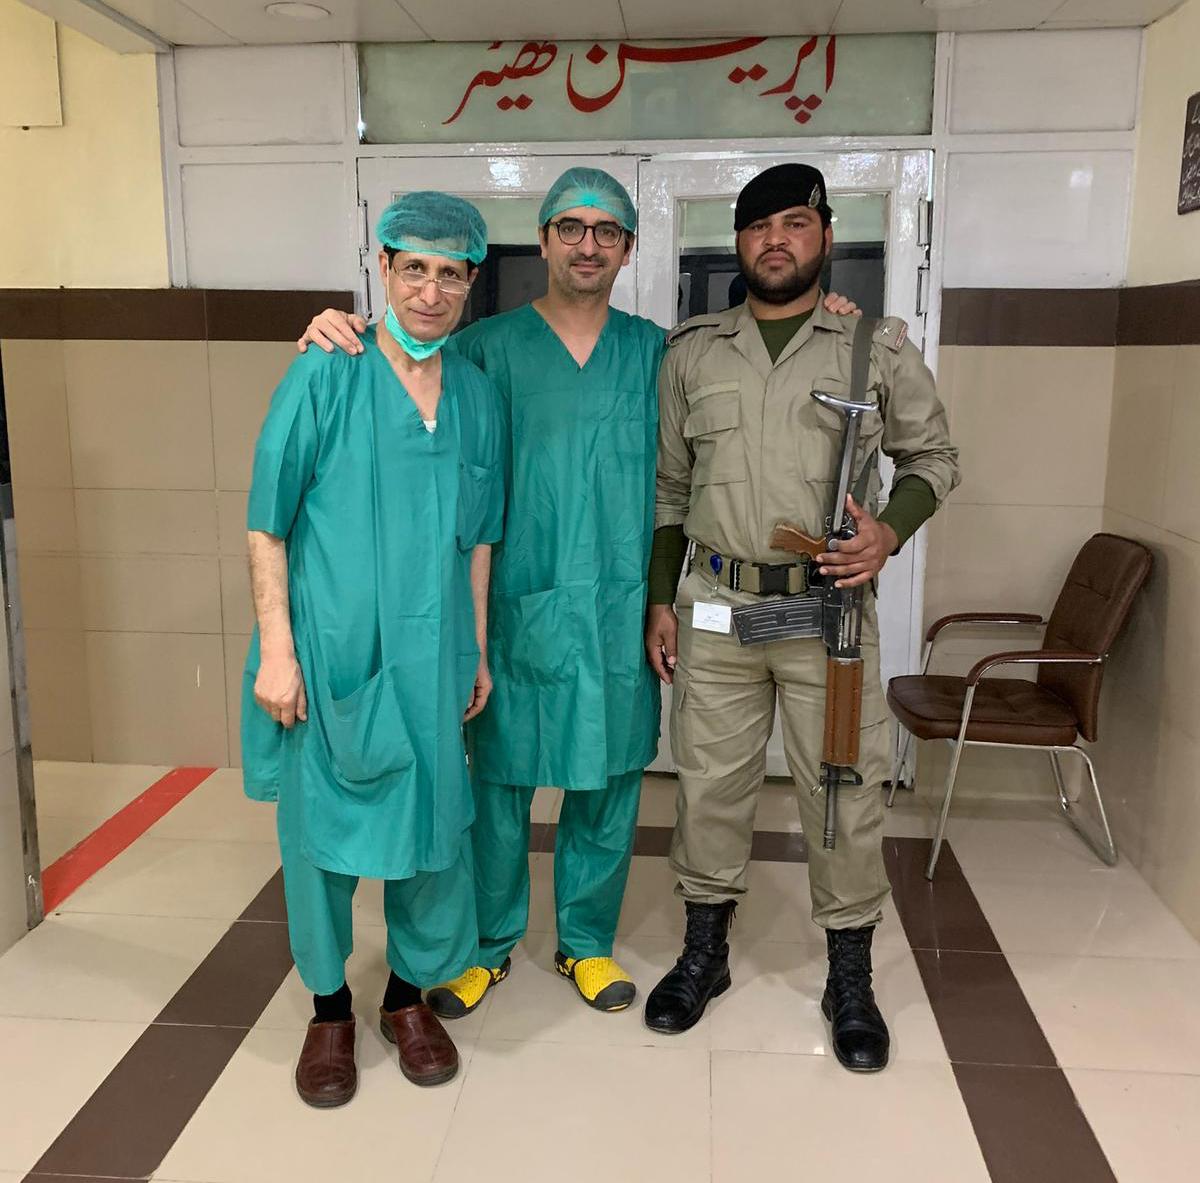 Diego González Rivas en Pakistán acompañado por un solado en quirófano.